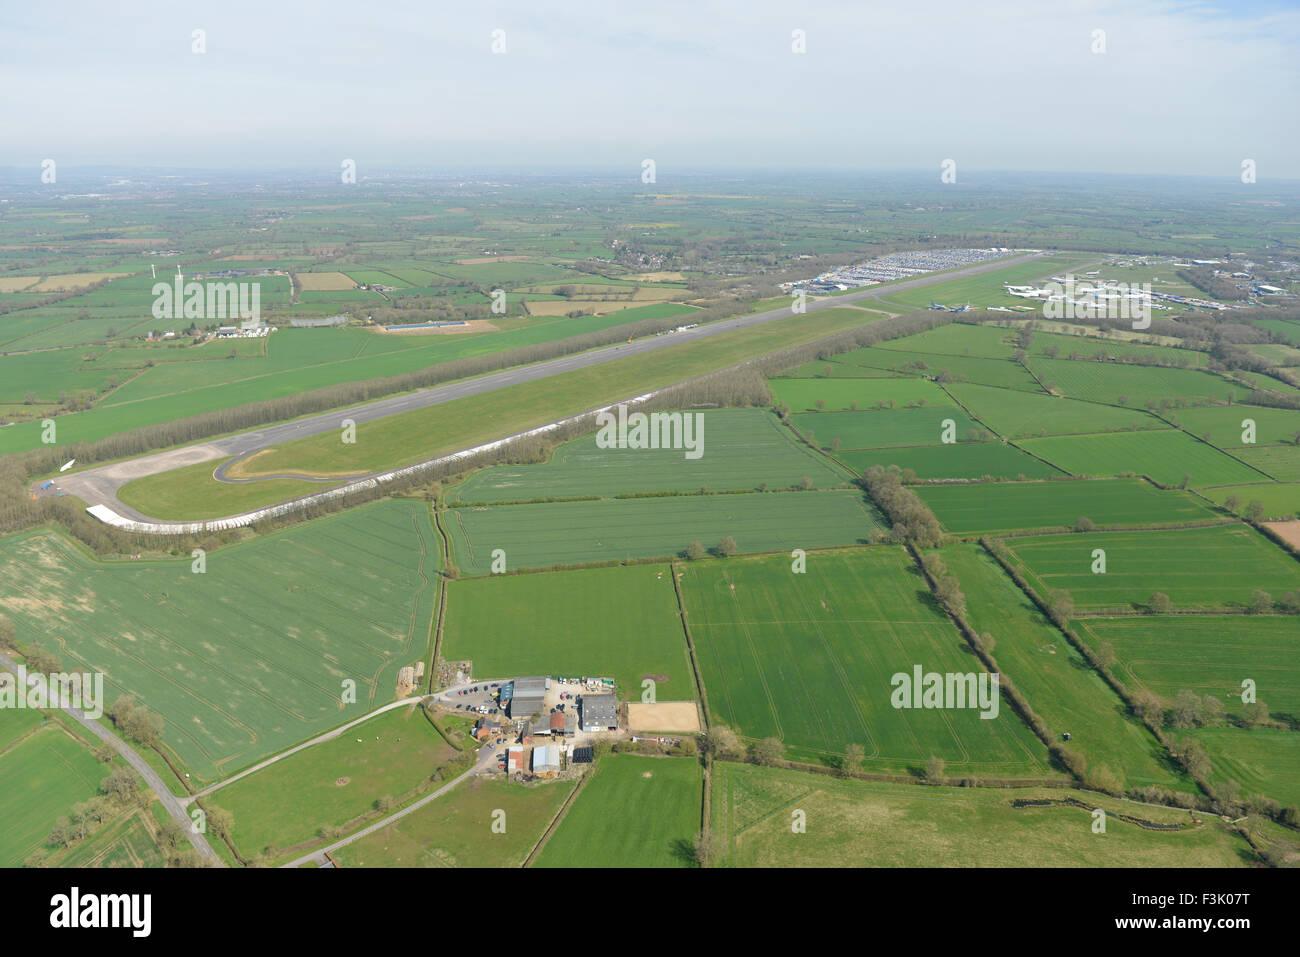 Luftbild der Bruntingthorpe Aerodrome und Fahrzeug Testgelände, Leicestershire Stockbild